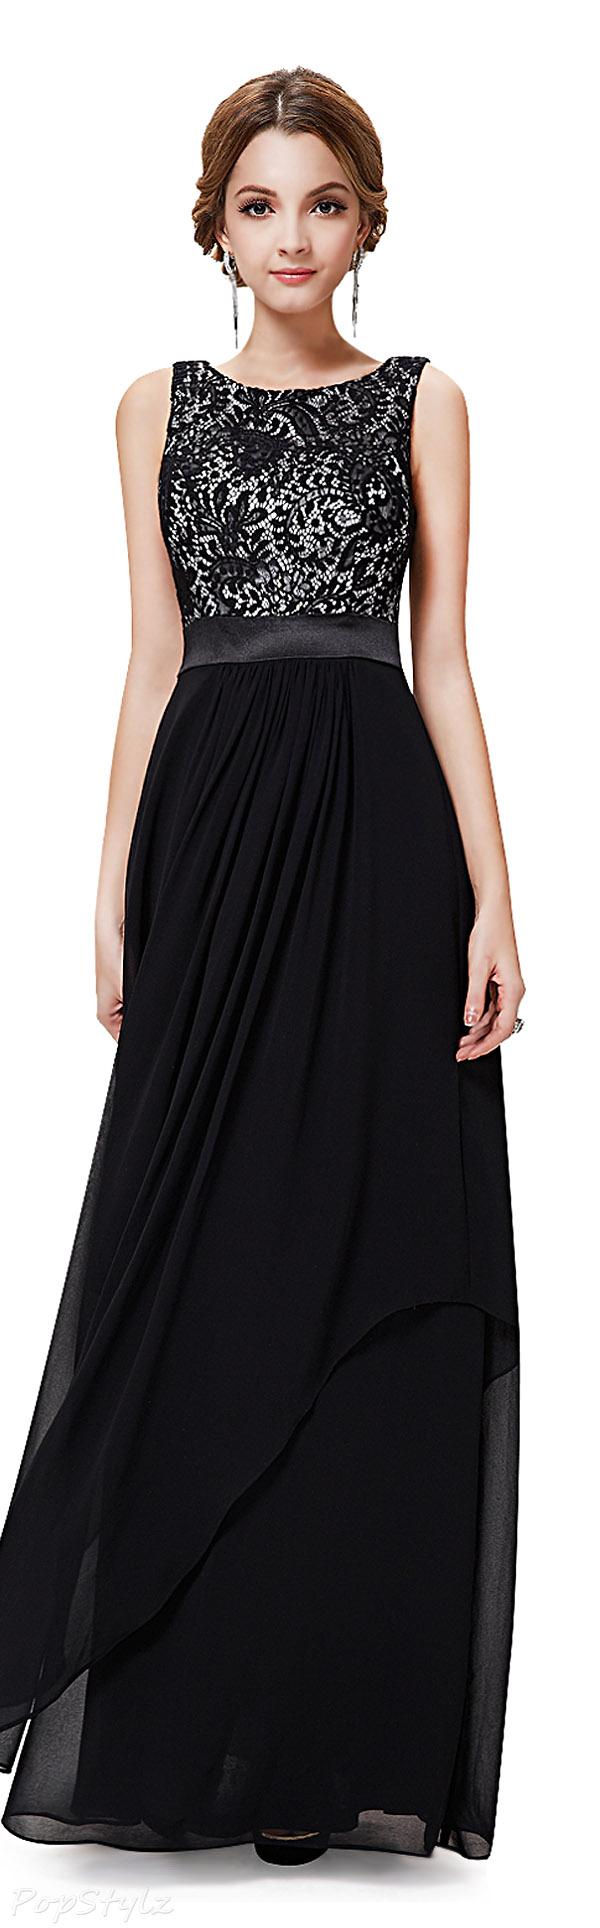 Ever Pretty 08217 Elegant Sleeveless Evening Dress